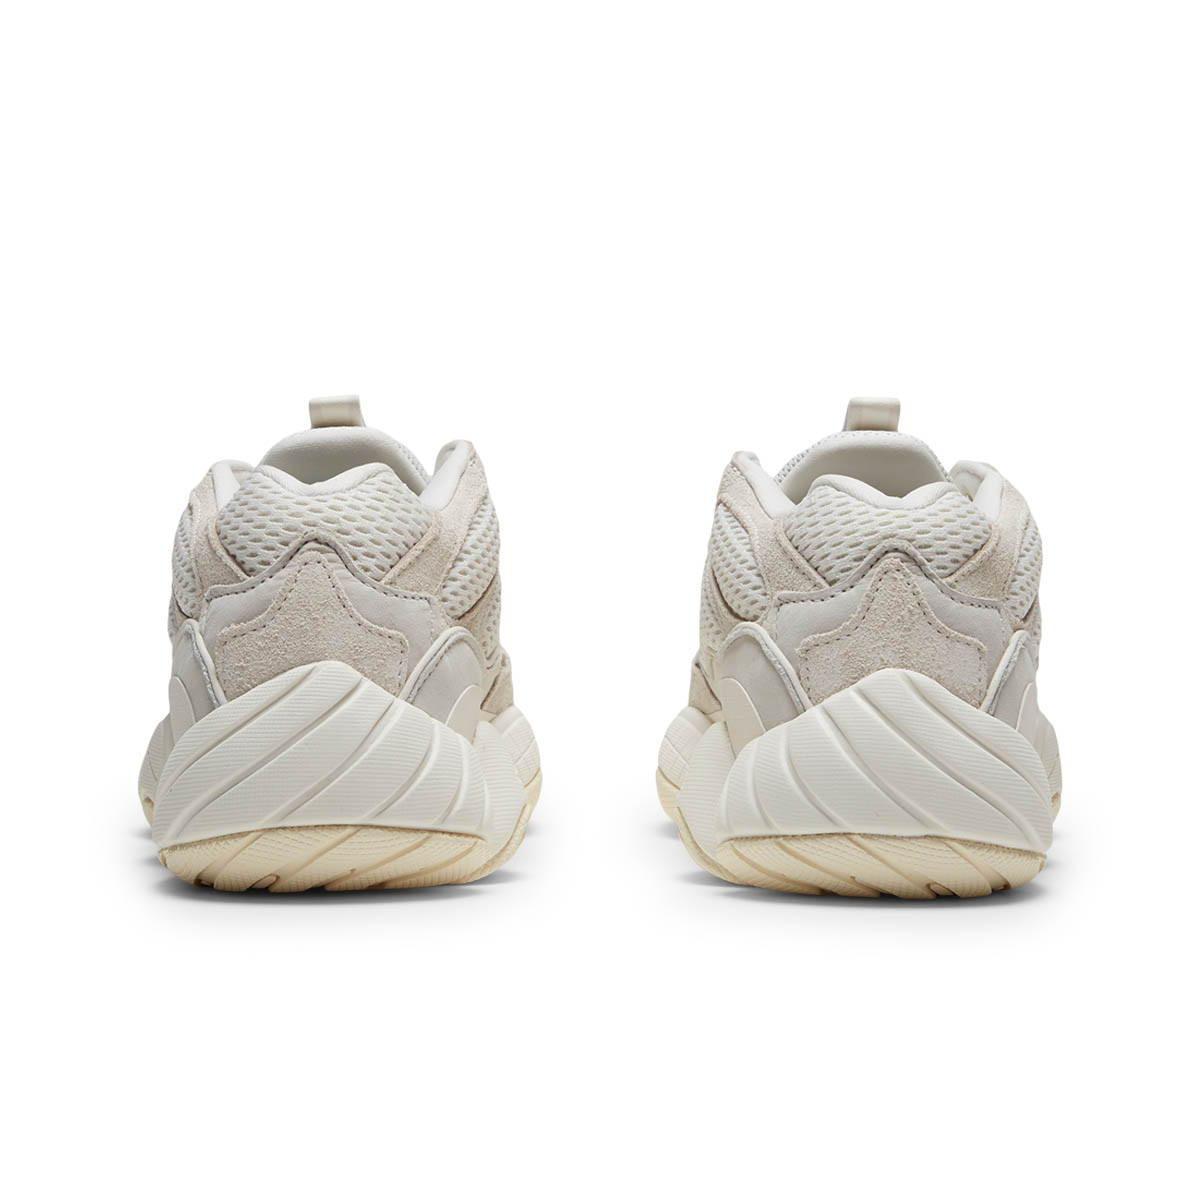 timeless design ca344 476ed 8/24/19: adidas Yeezy 500 (QS) – Bodega